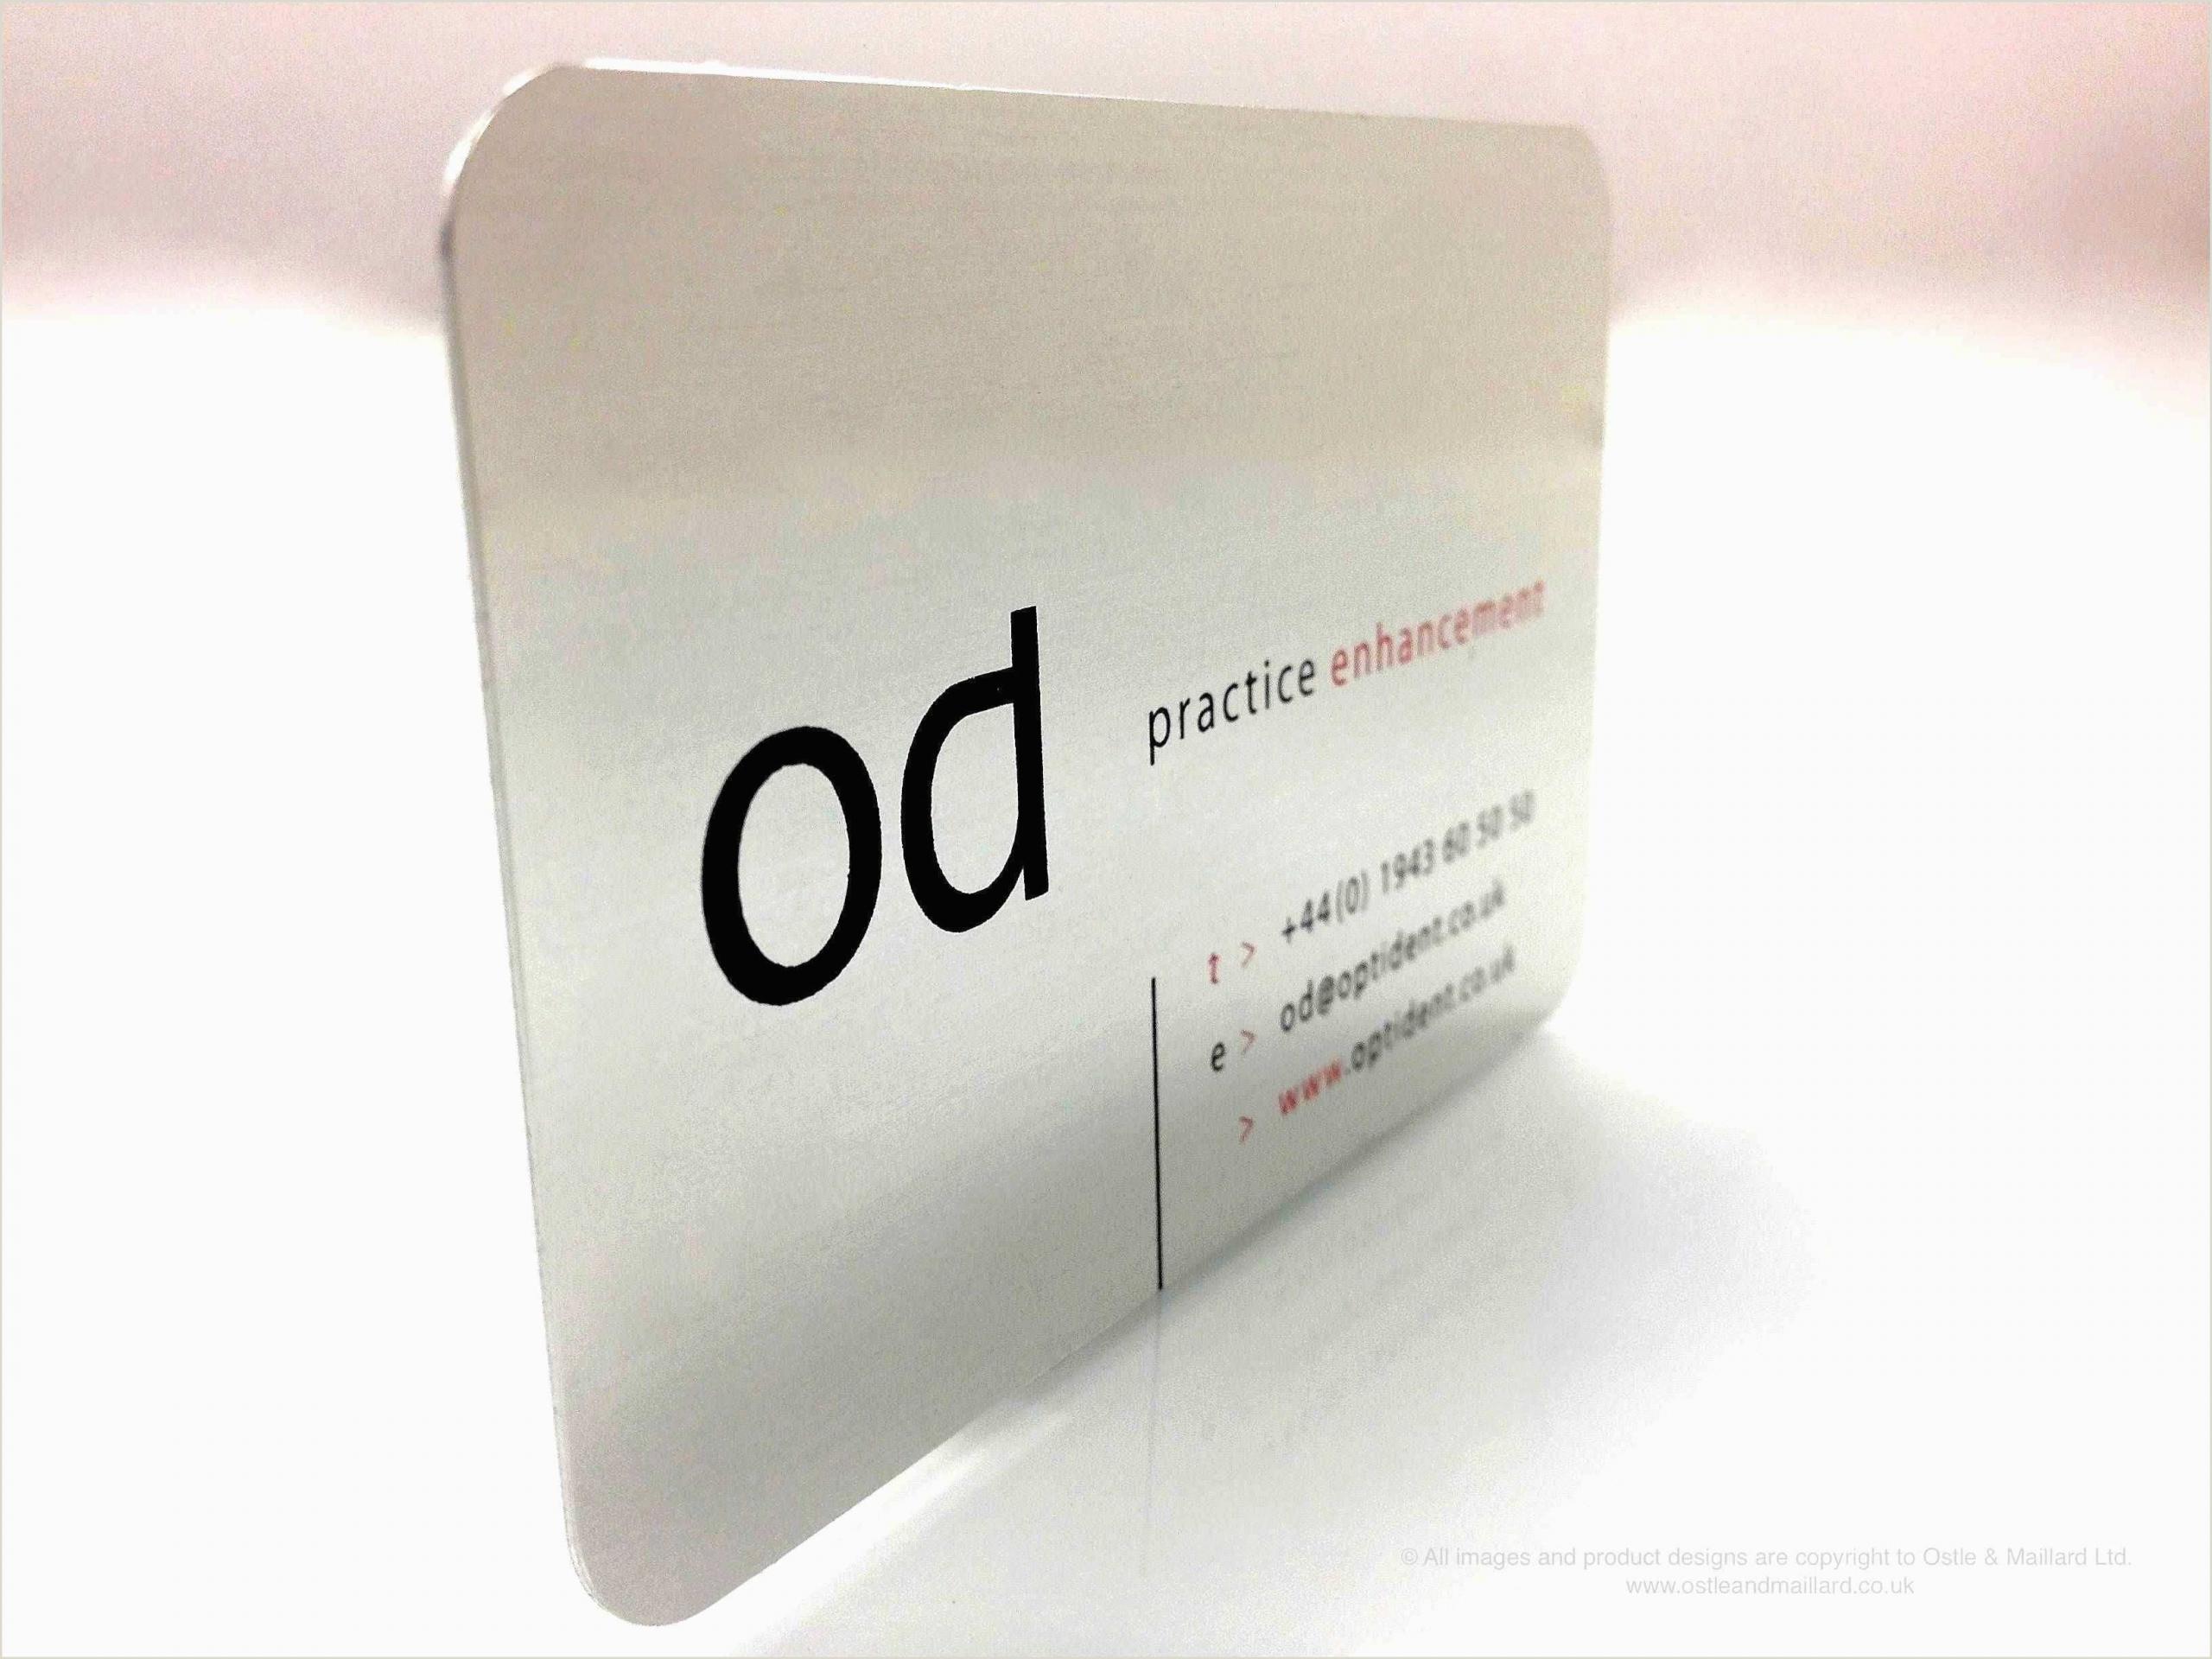 Calling Card Ideas Business Card Template Word 2020 Addictionary